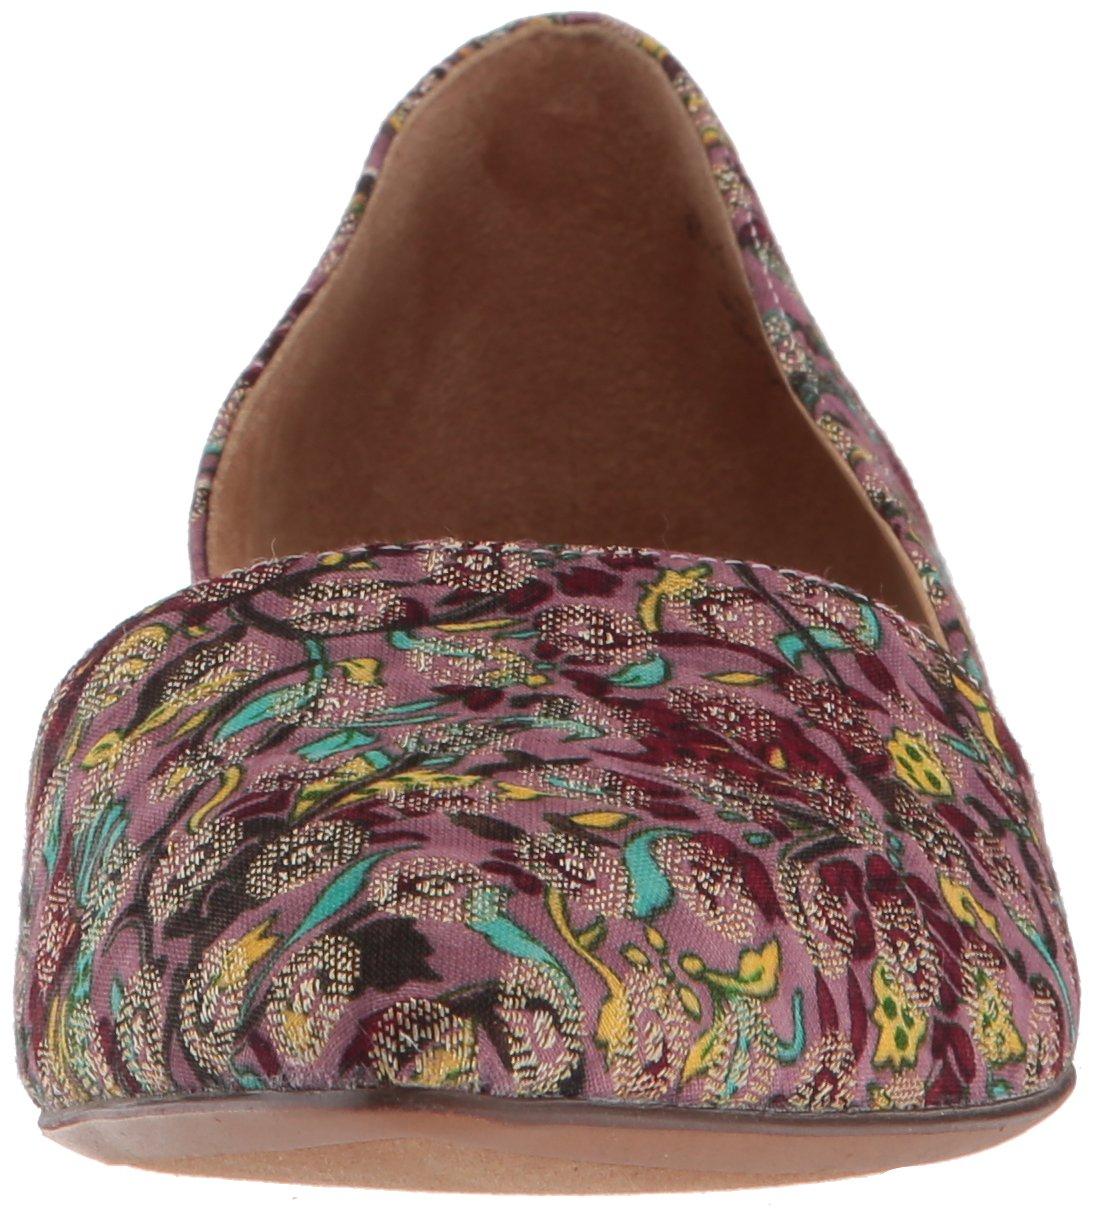 Naturalizer Women's Samantha Pointed Toe Flat B0756KPRSK 8.5 B(M) US|Brocade